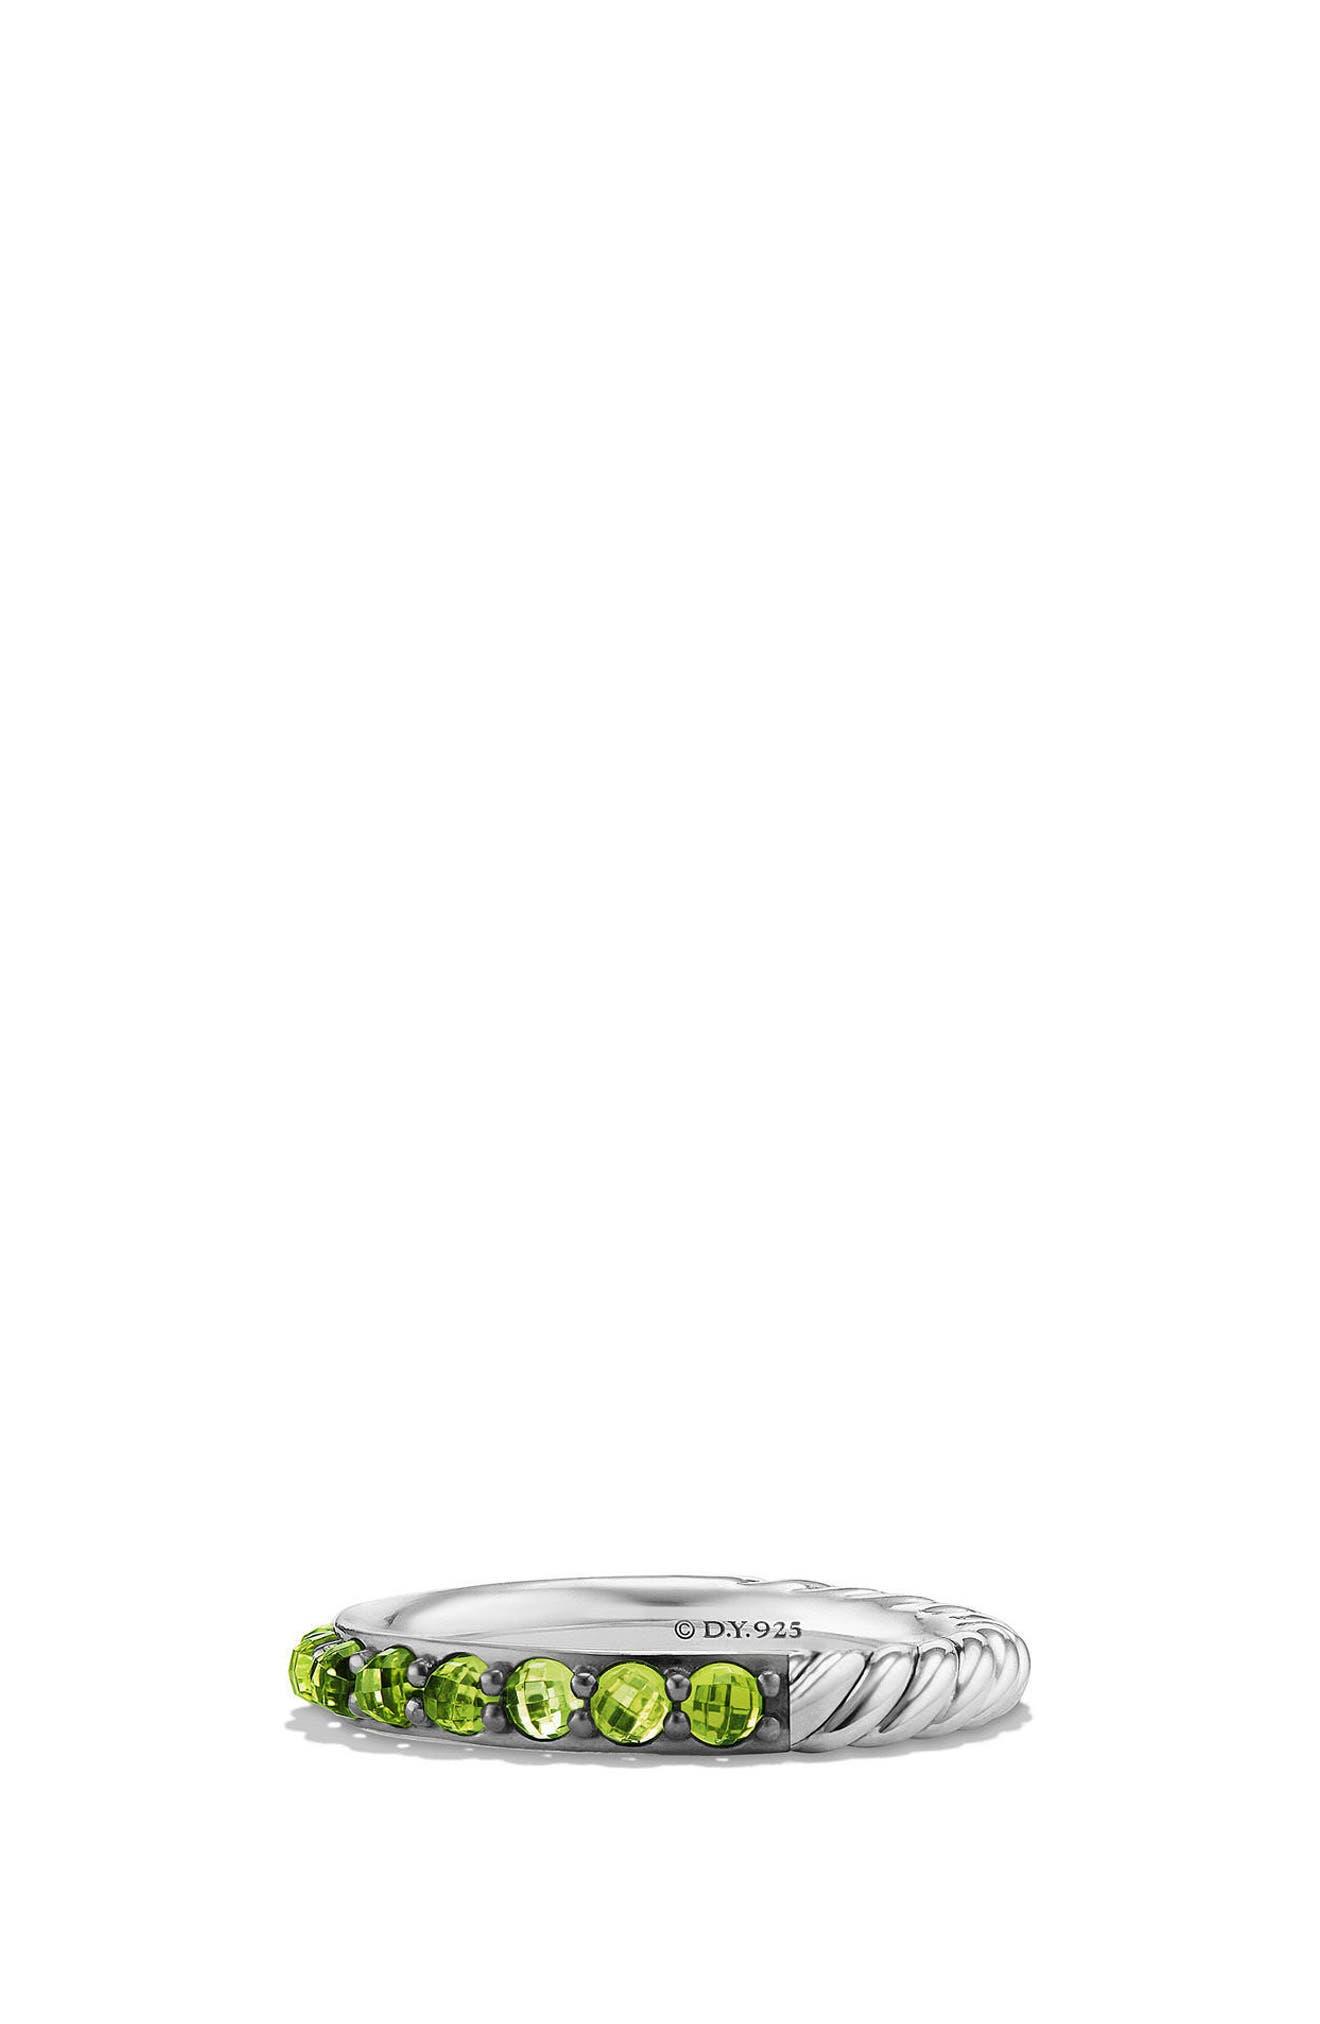 DAVID YURMAN Osetra Semiprecious Stone Stack Ring